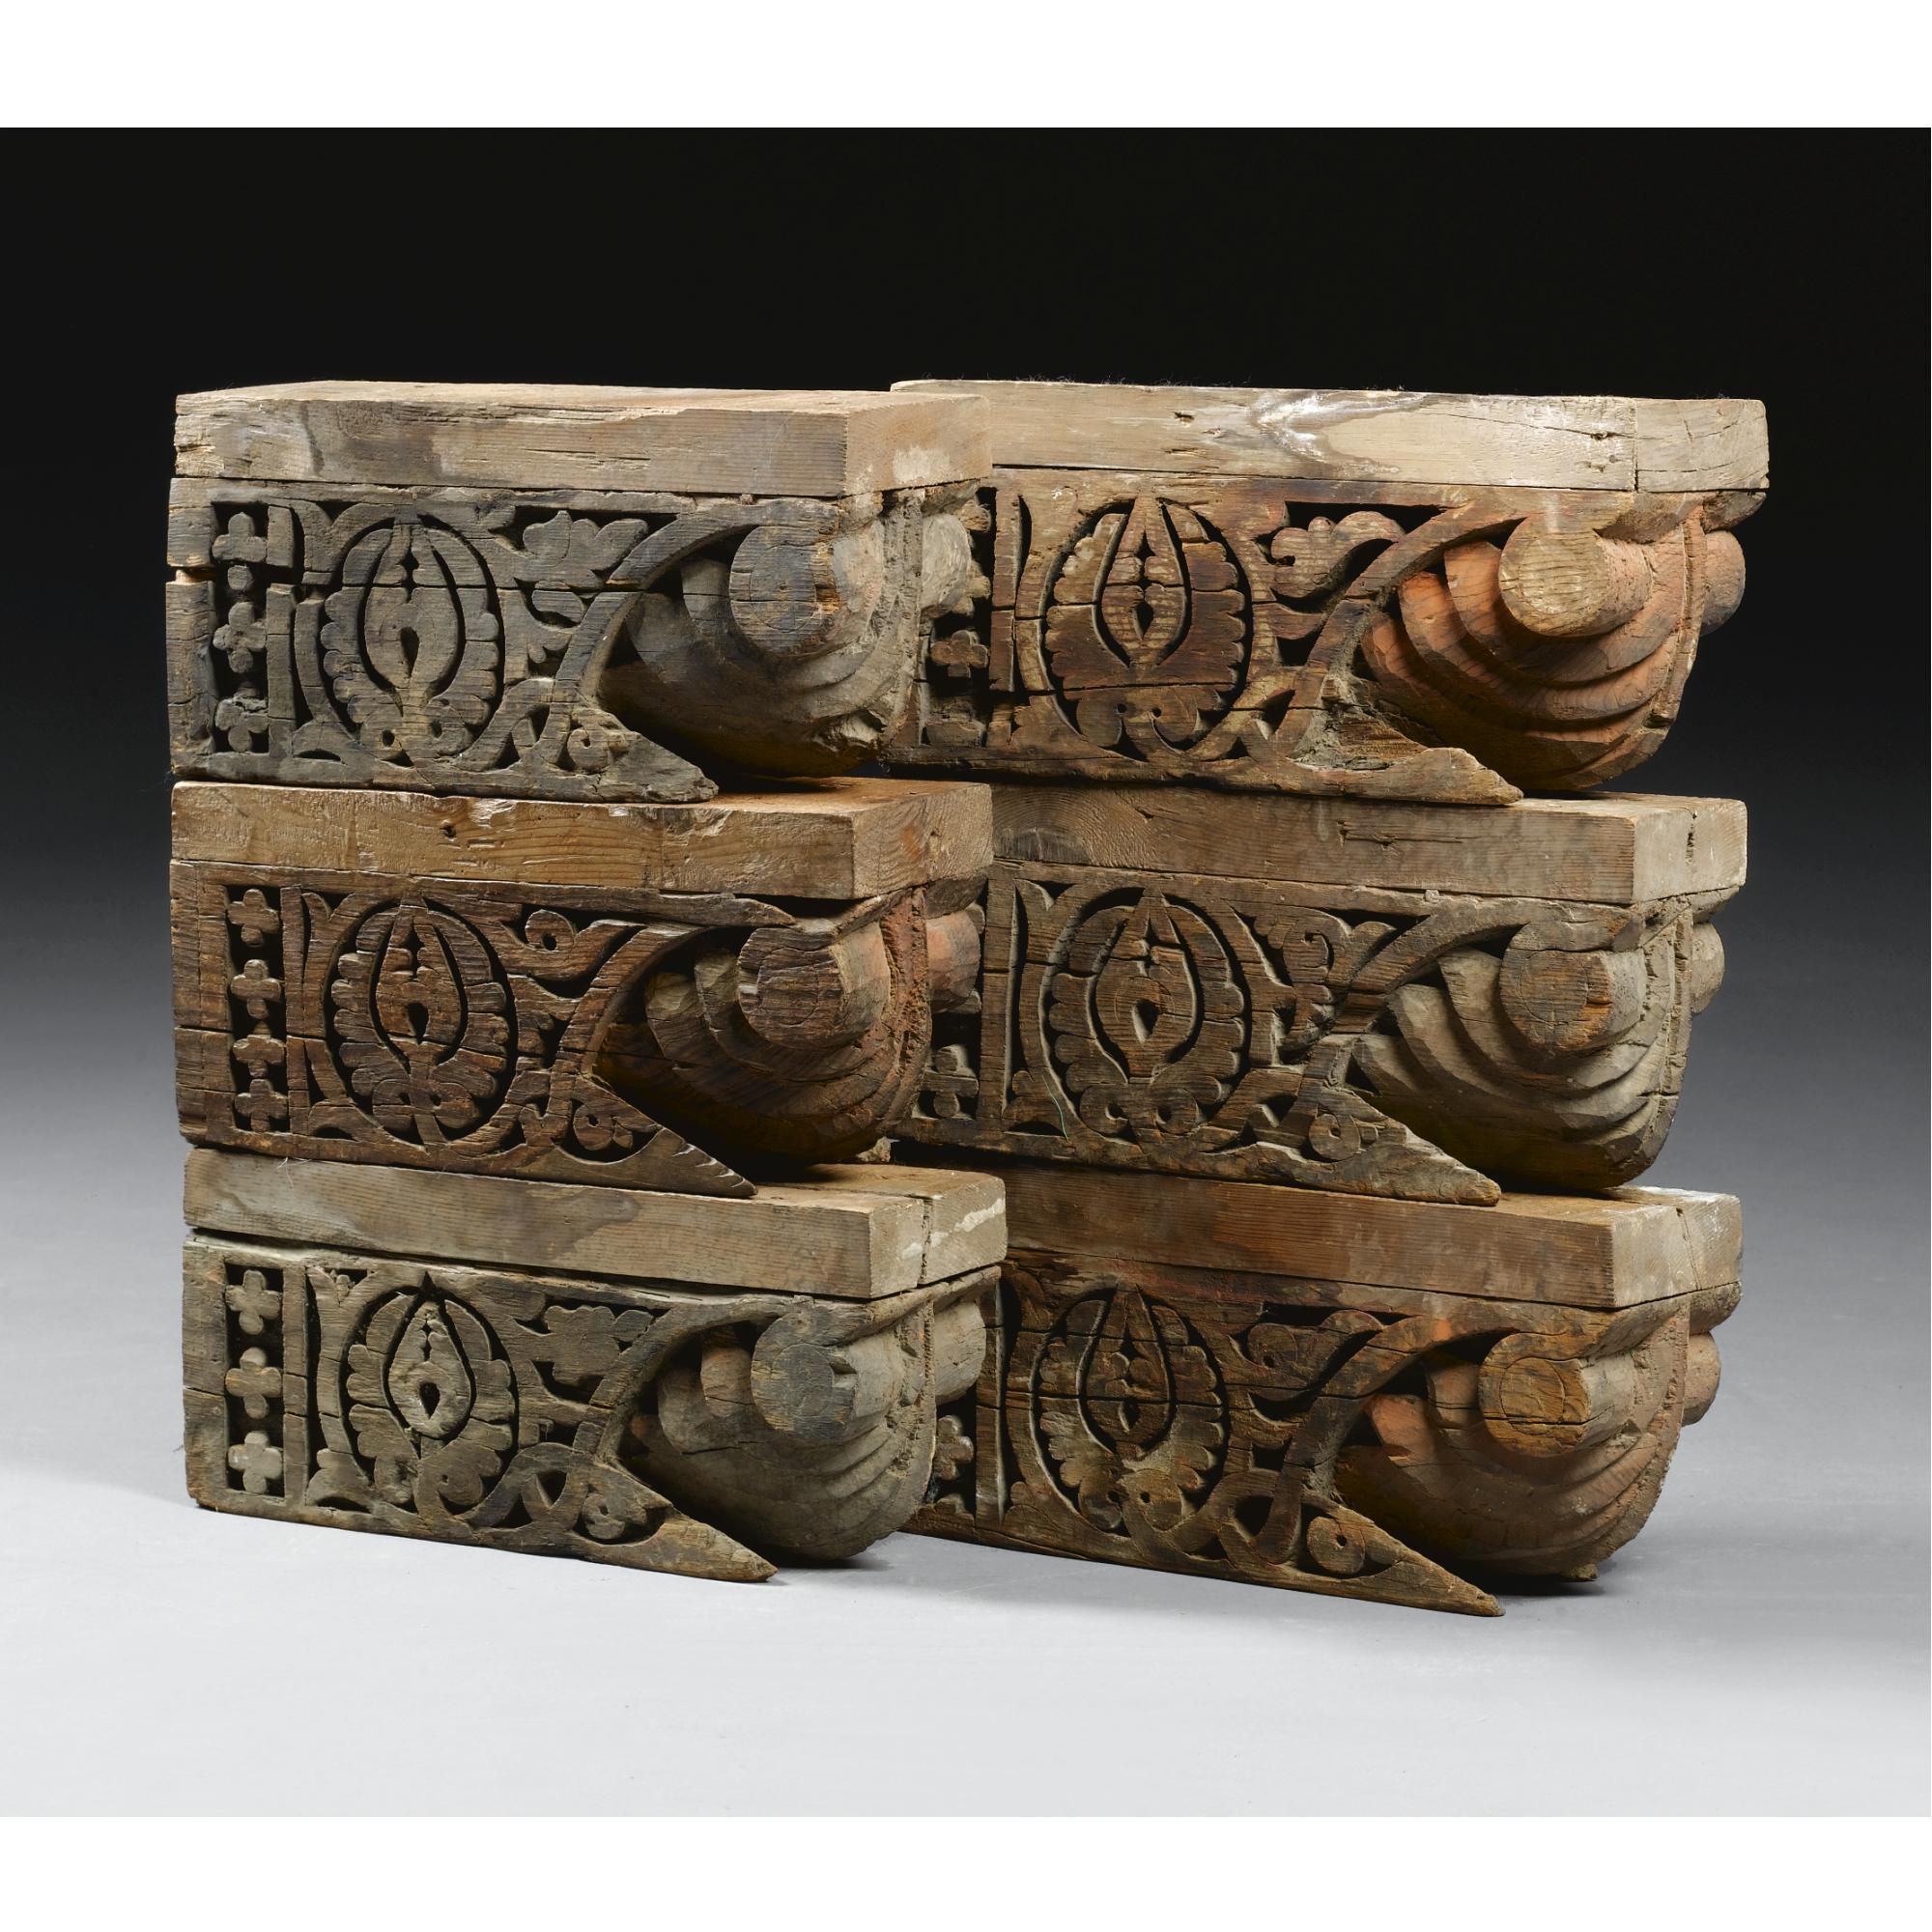 Six Mudejar Carved Wooden Corbels, Toledo, Spain, 13th-14th Century